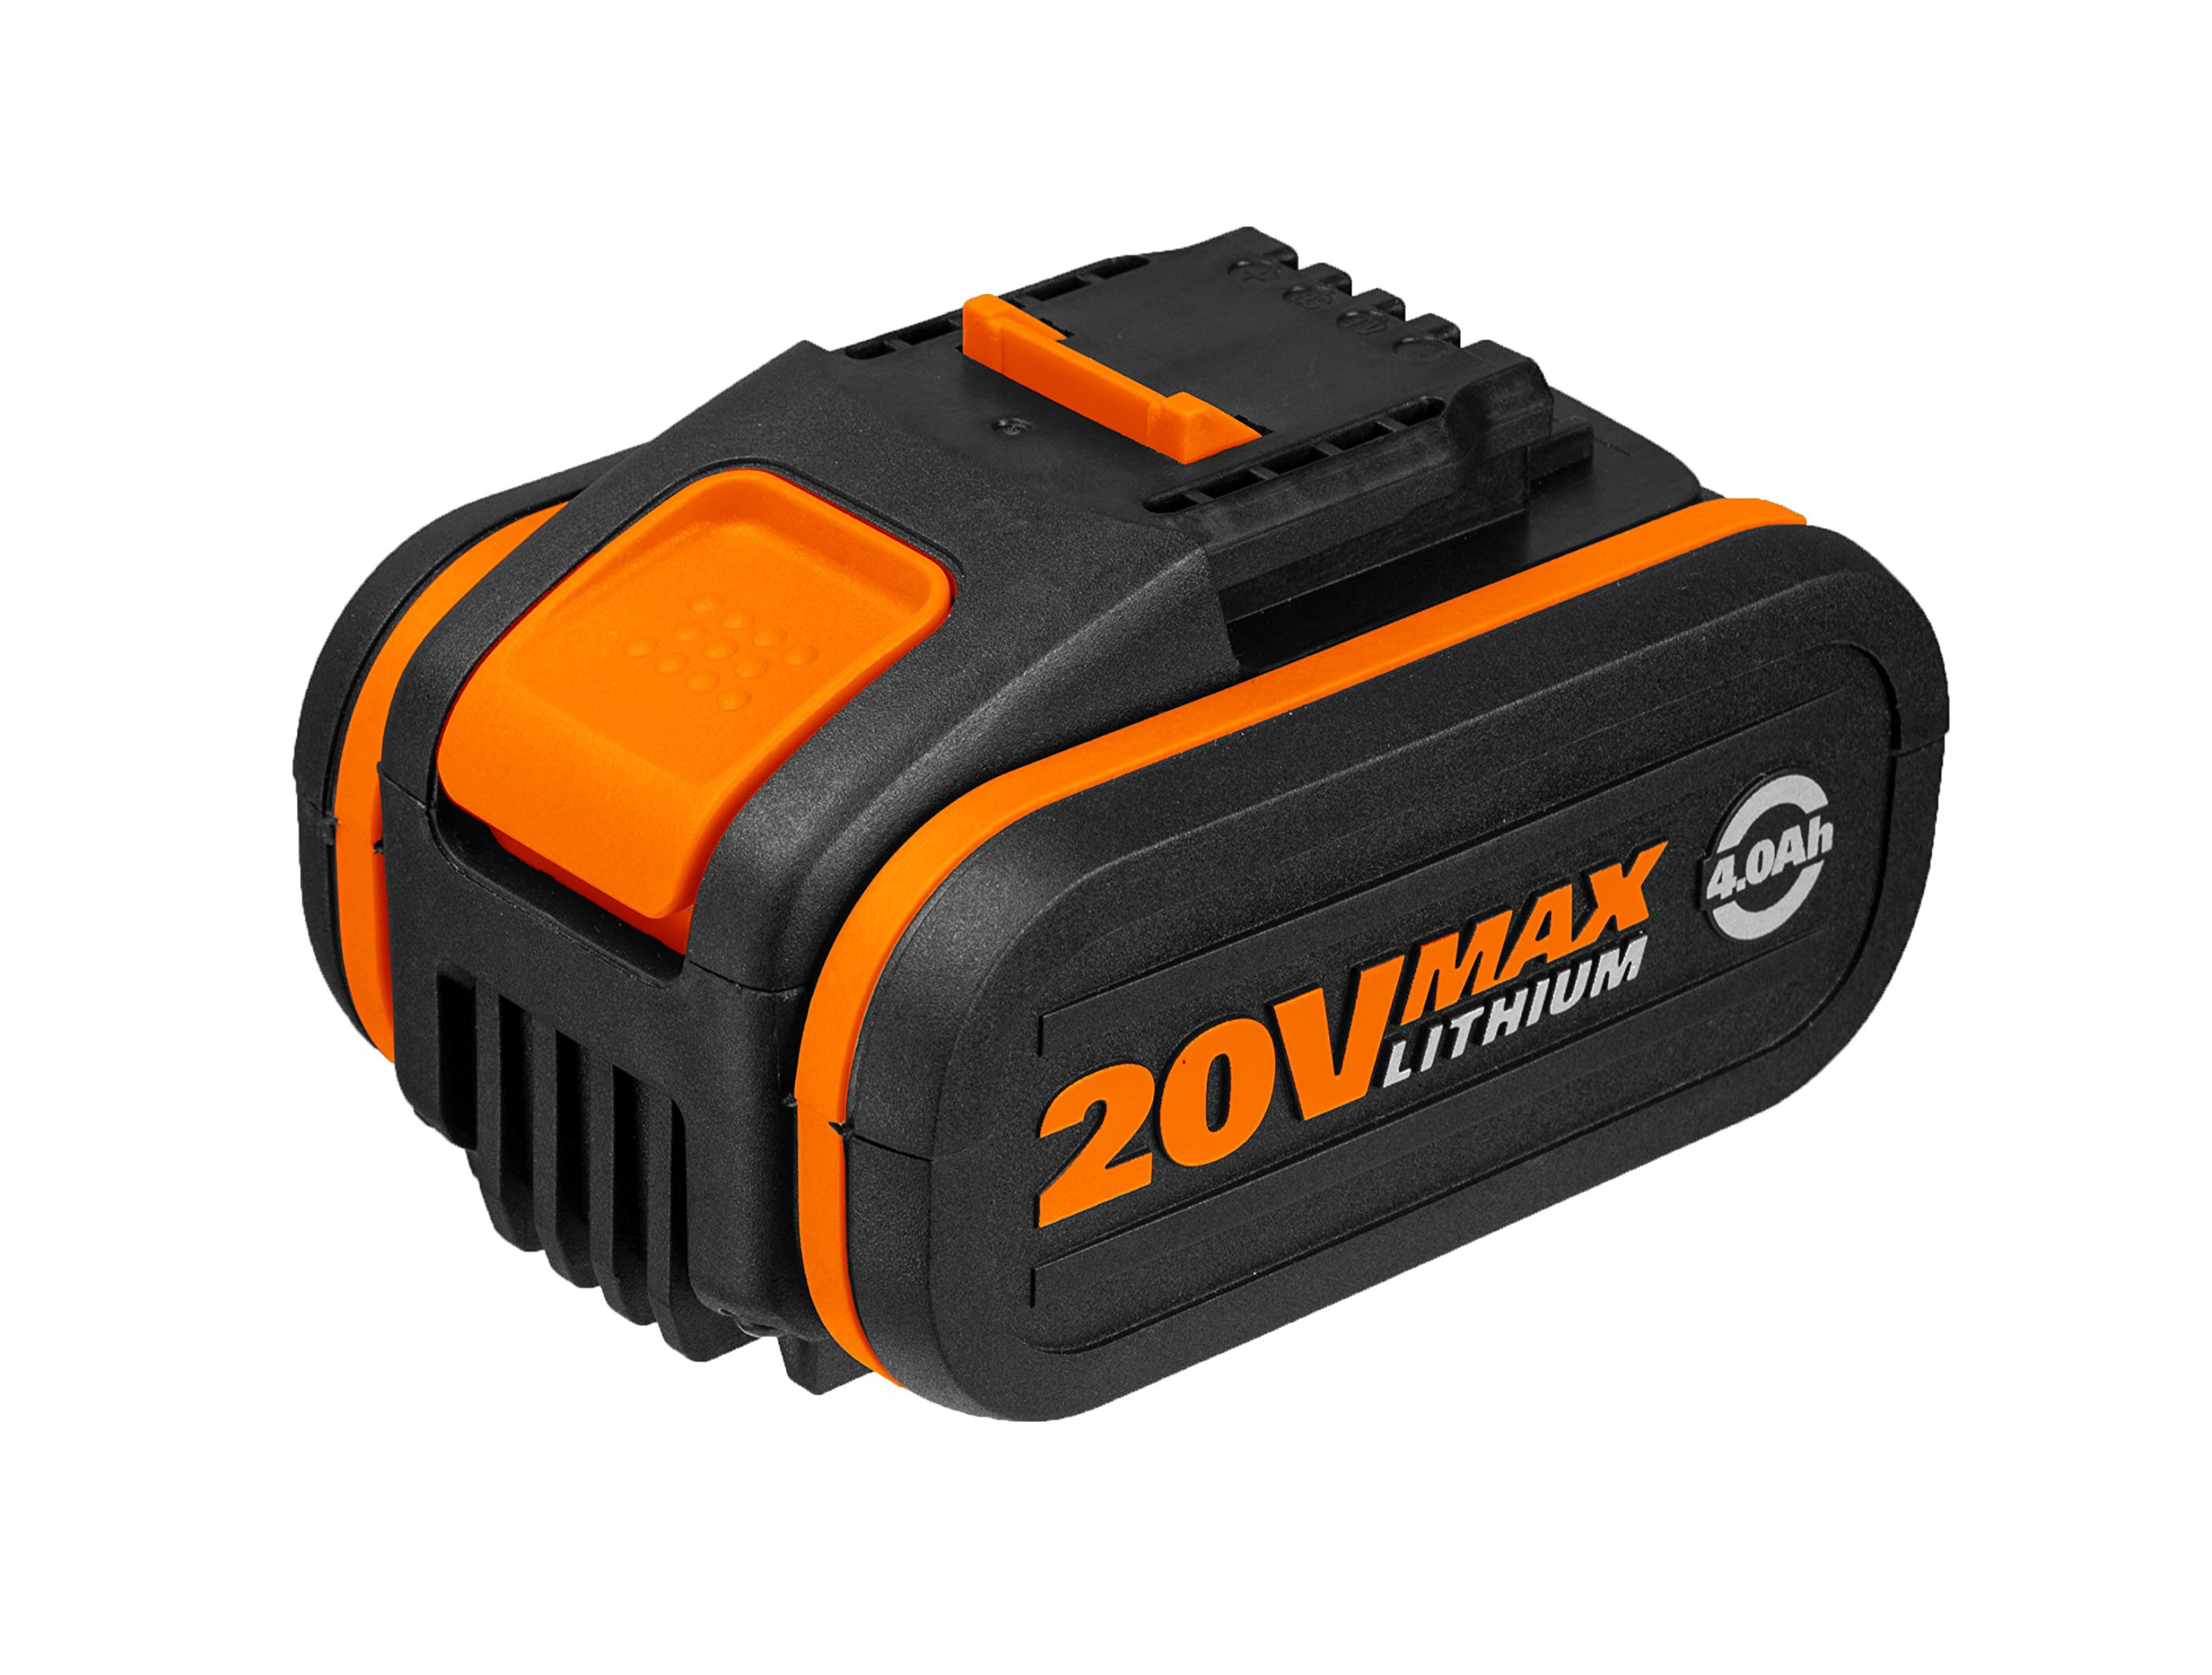 Worx WA3553 Akku 20V, 4,0Ah, für alle WORX Geräte – 4000mAh Li-Ion Akku PowerShare